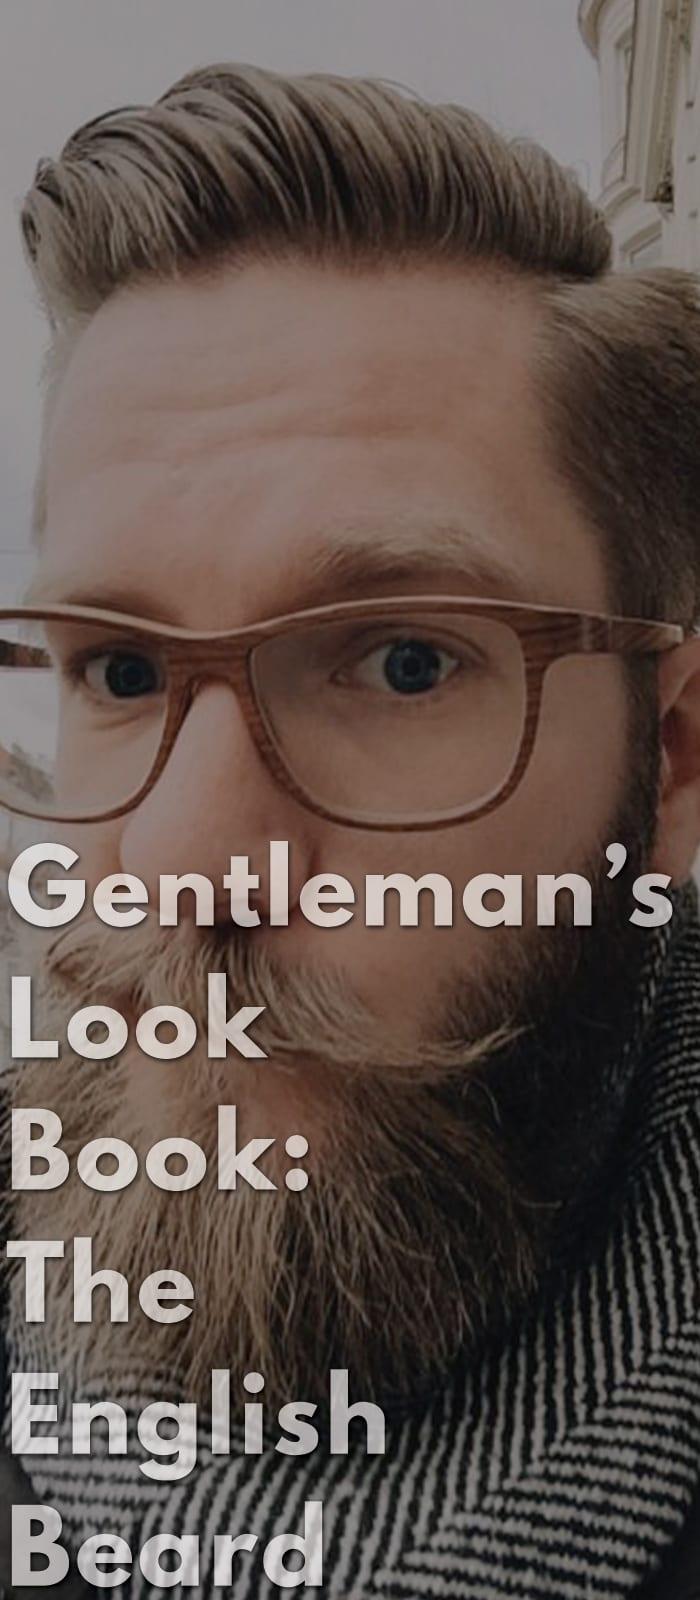 Gentleman's-Look-Book-The-English-Beard.